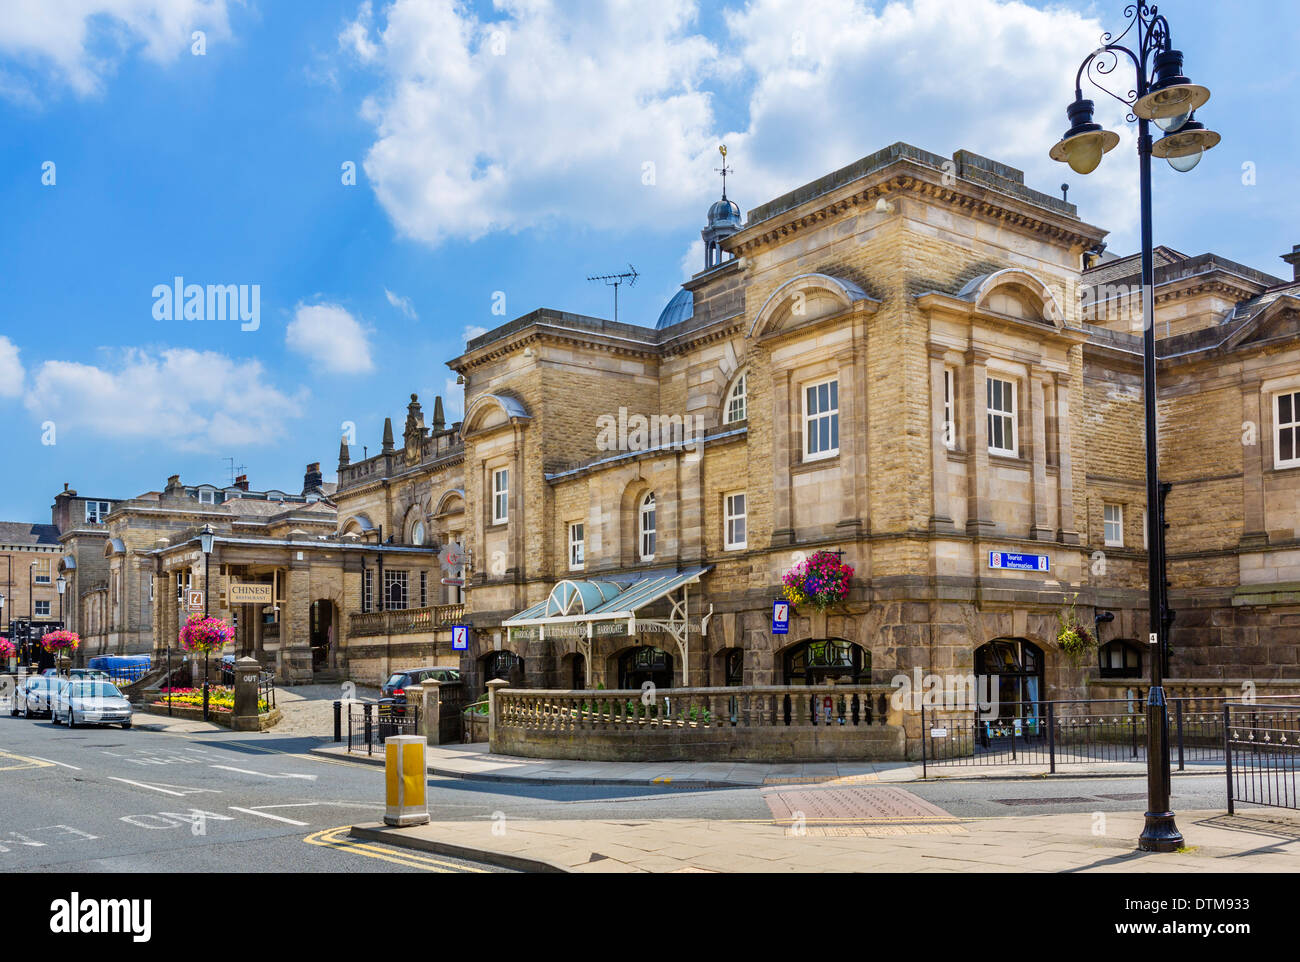 The Royal Baths buildings, Harrogate, North Yorkshire, England, UK - Stock Image